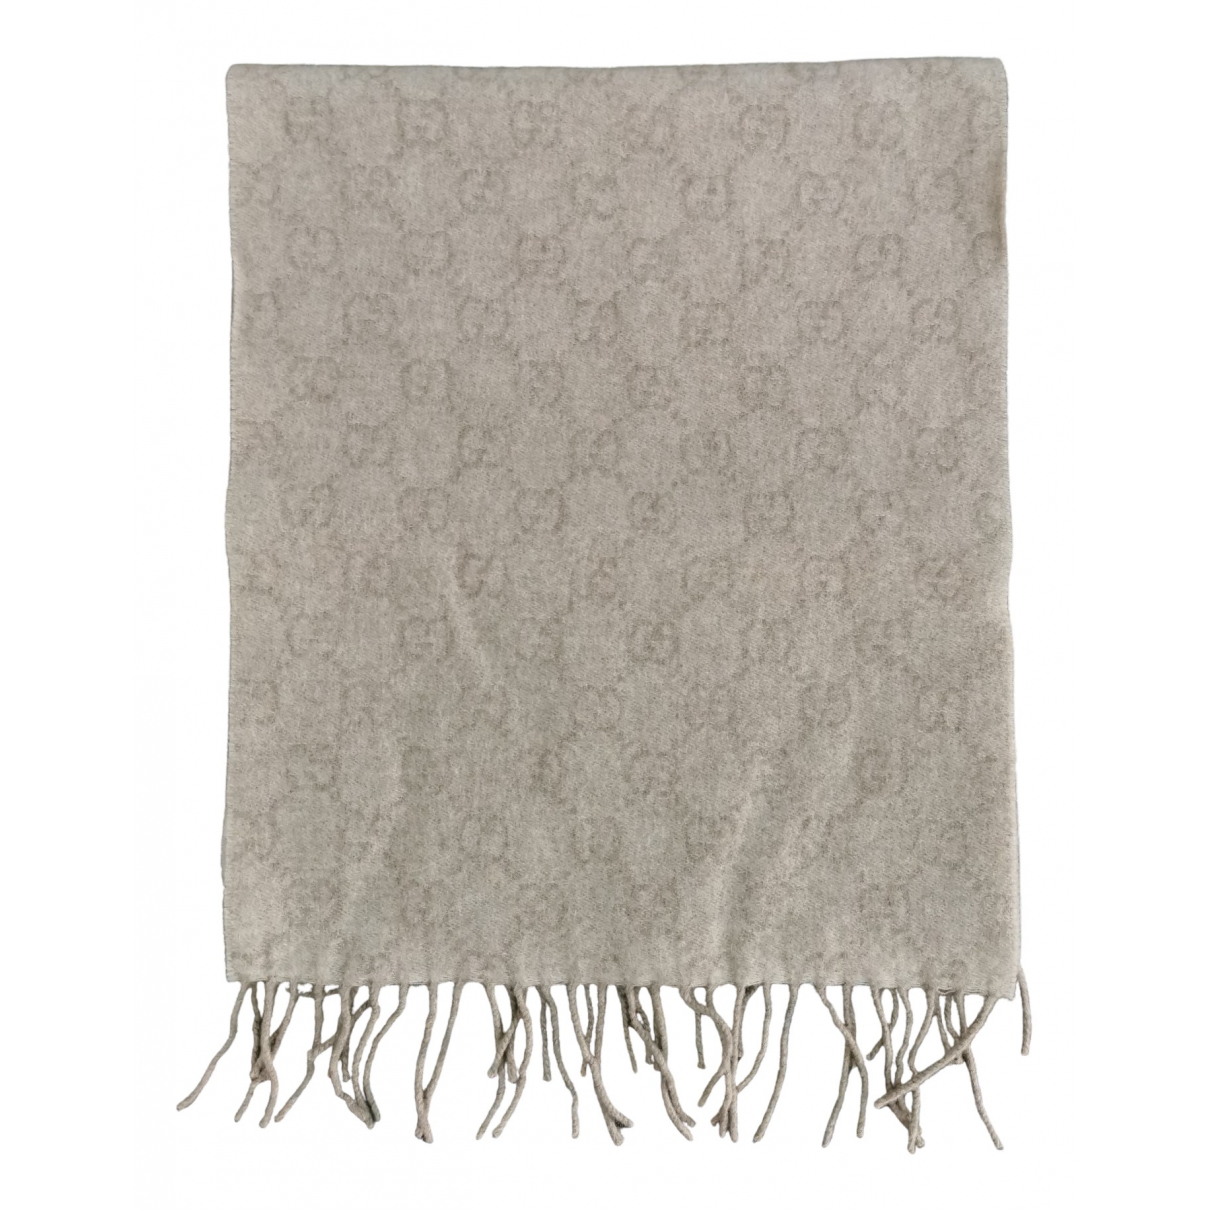 Gucci \N Beige Cashmere scarf for Women \N